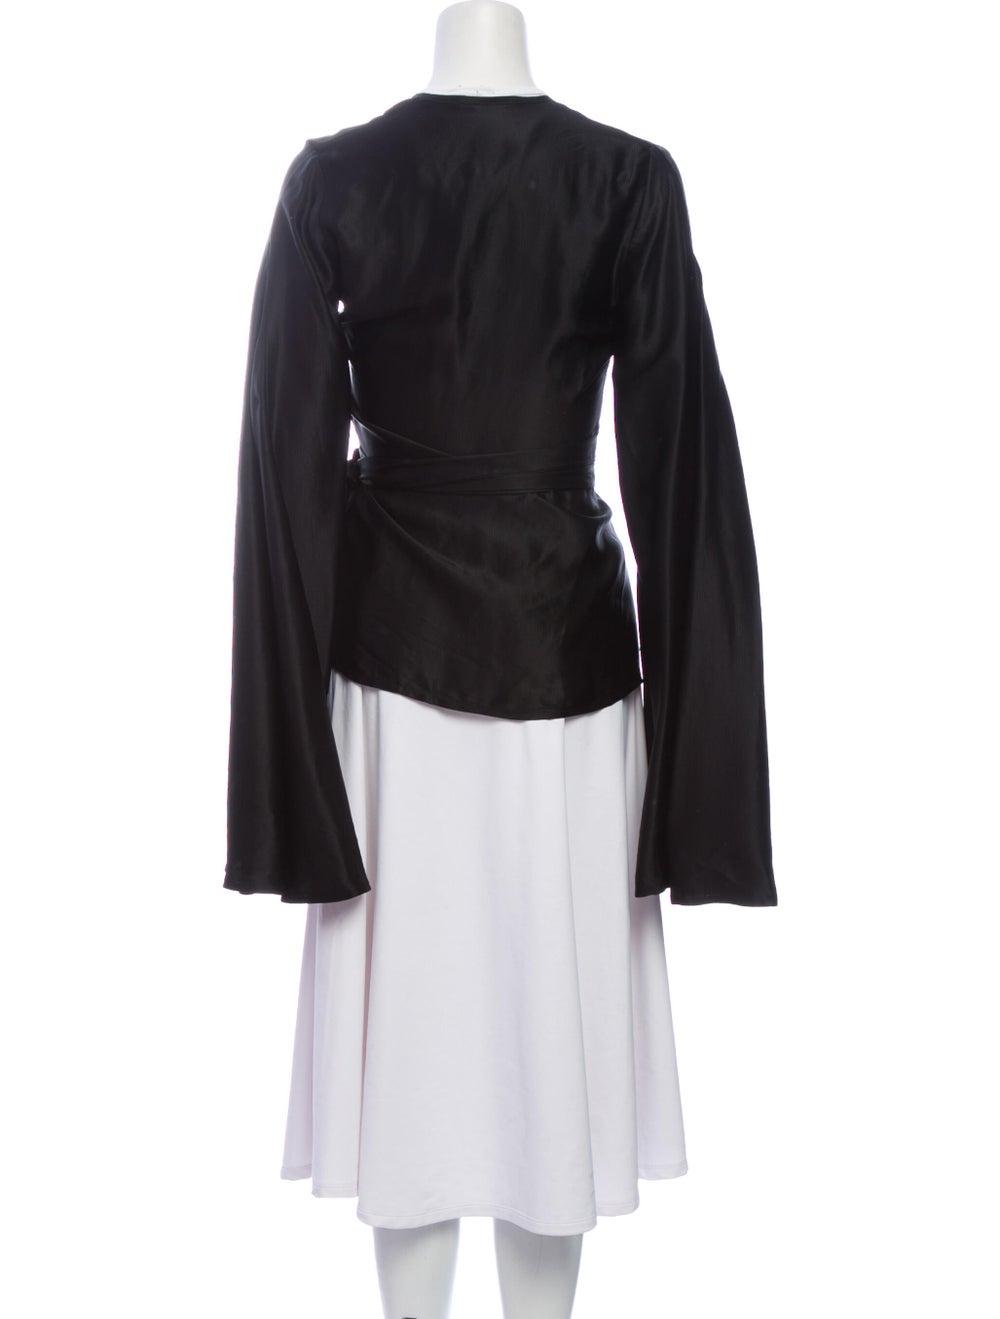 Beaufille V-Neck Long Sleeve Blouse Black - image 3